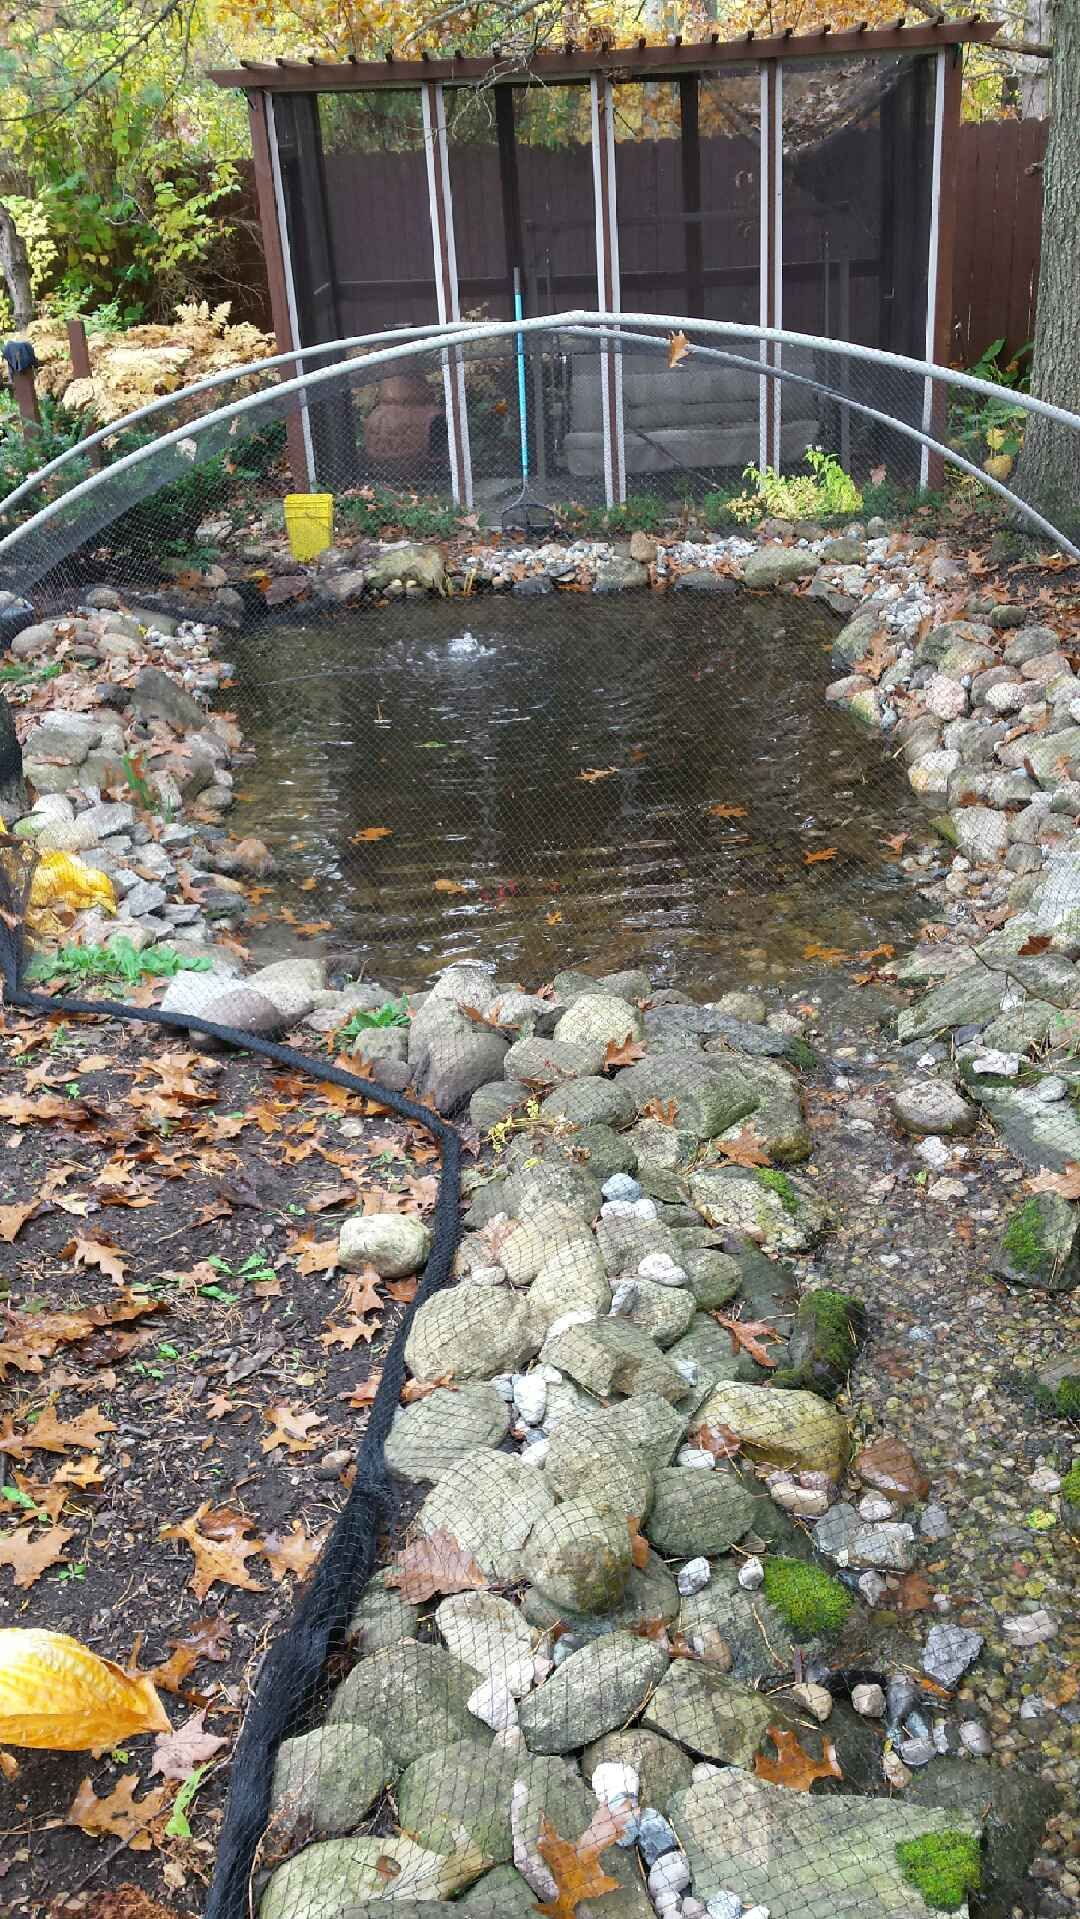 Retention Pond In Backyard - BACKYARD HOME